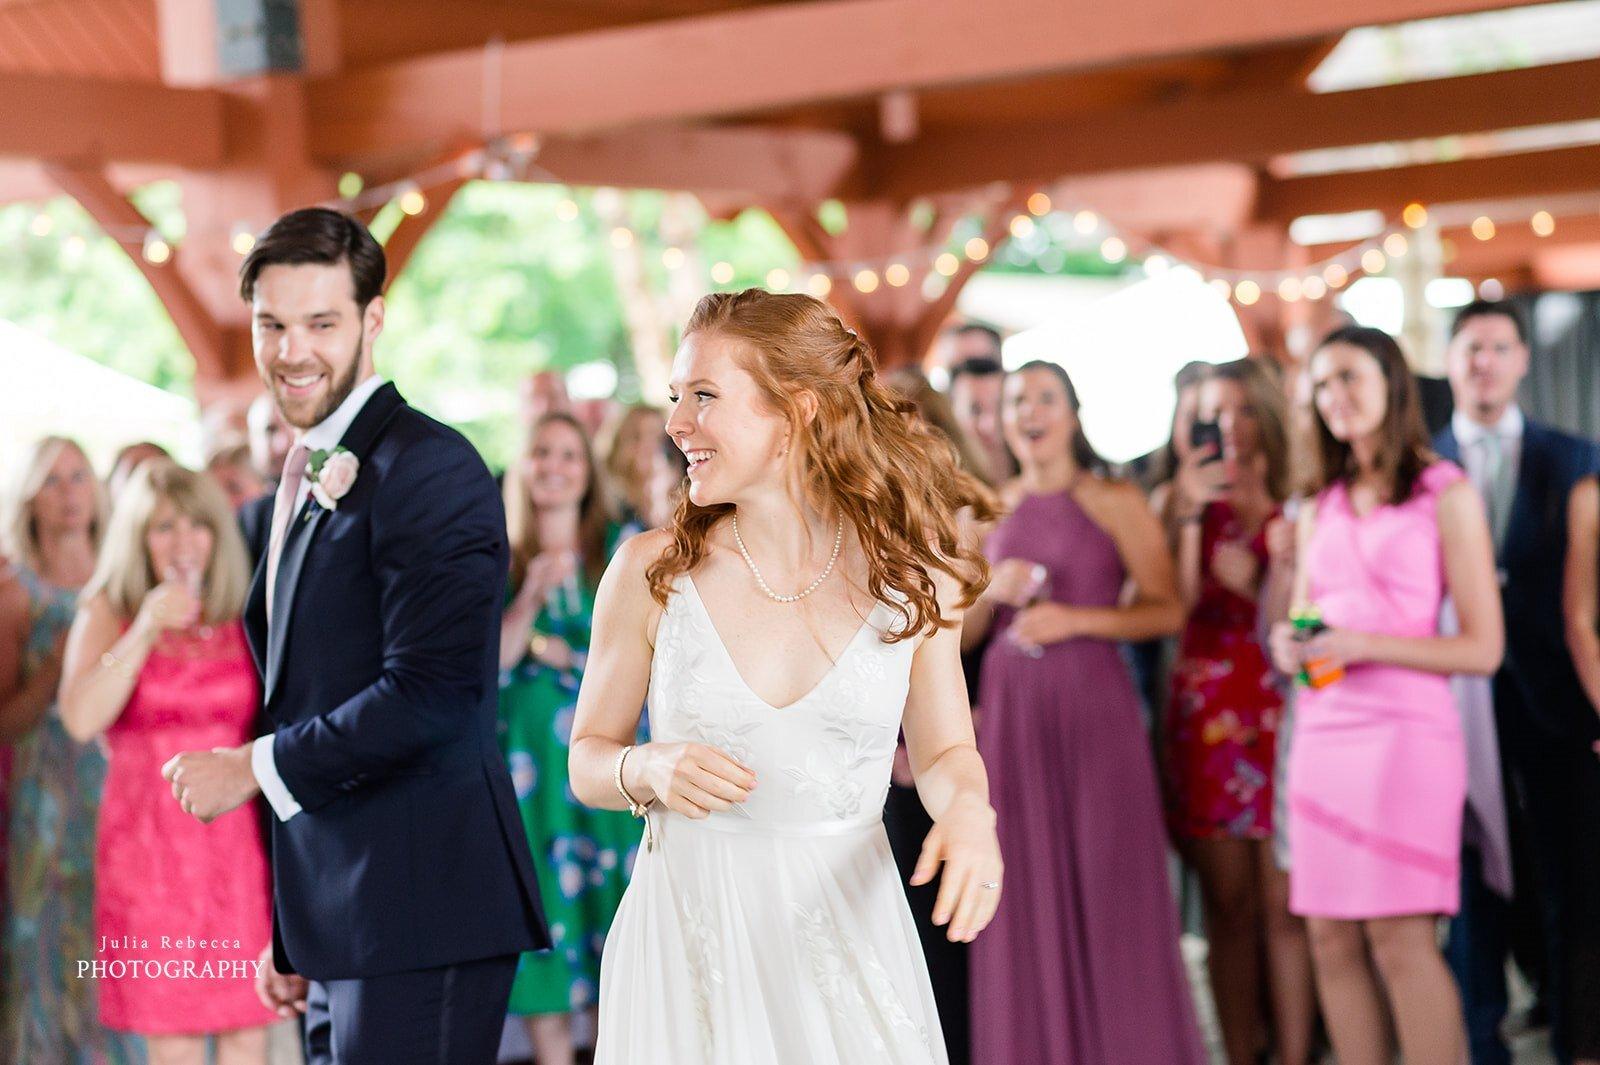 Camp-Chingachgook-Wedding-Lauren-and-Christian-Lake-George